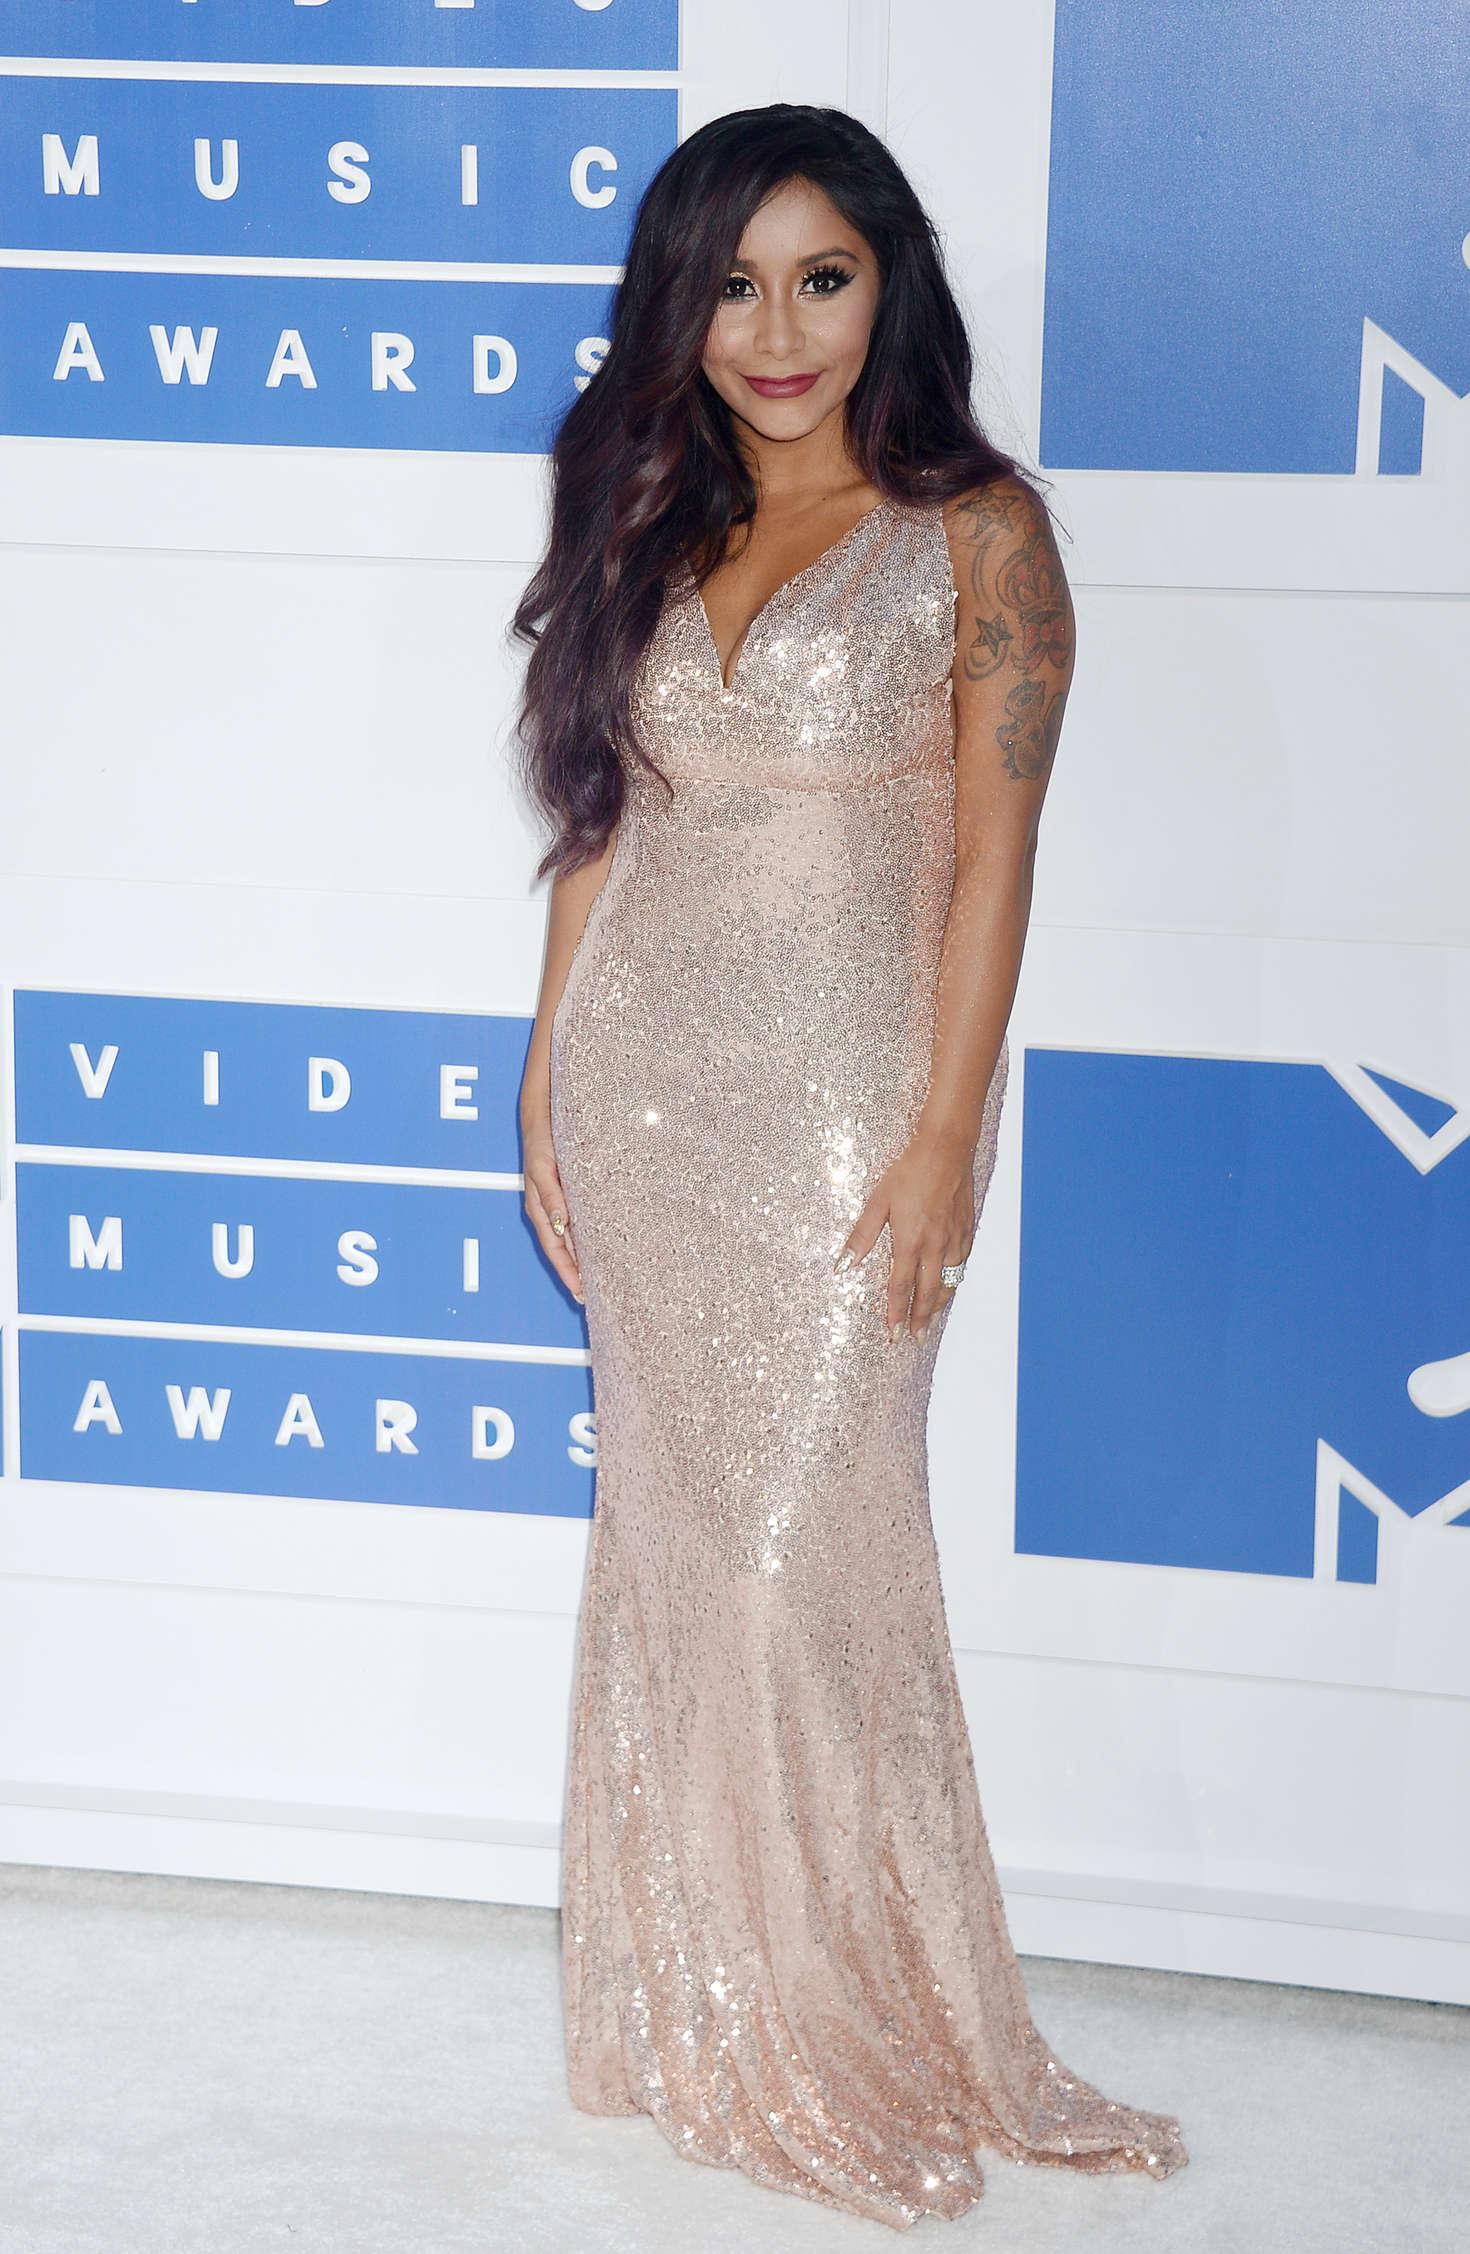 Nicole Snooki Polizzi - 2016 MTV Video Music Awards in New York City